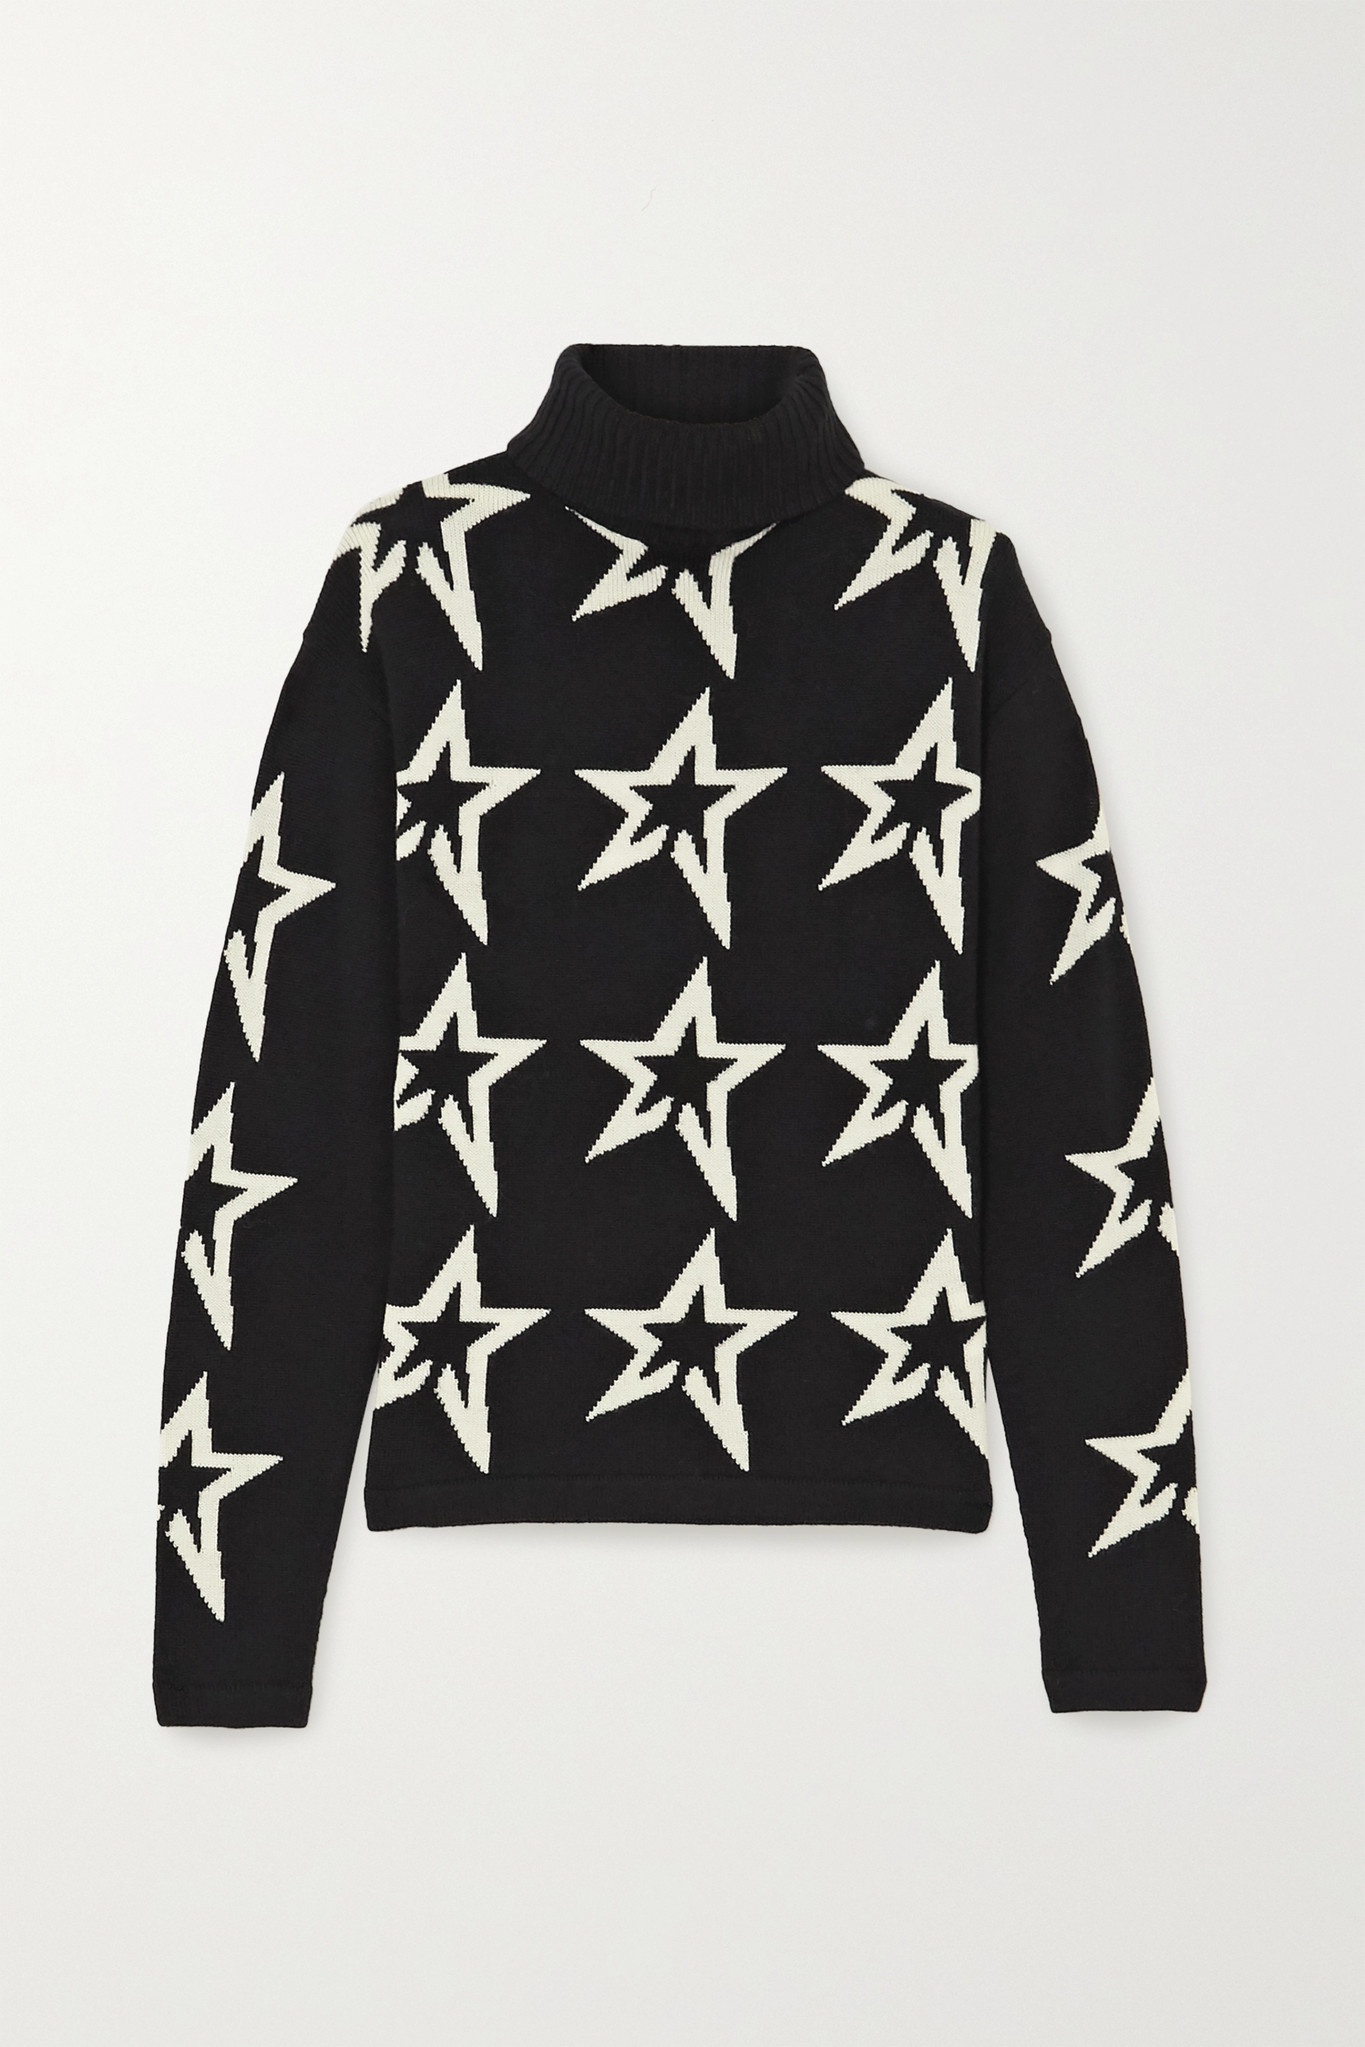 PERFECT MOMENT - Star Dust Intarsia Merino Wool Turtleneck Sweater - Black - x small